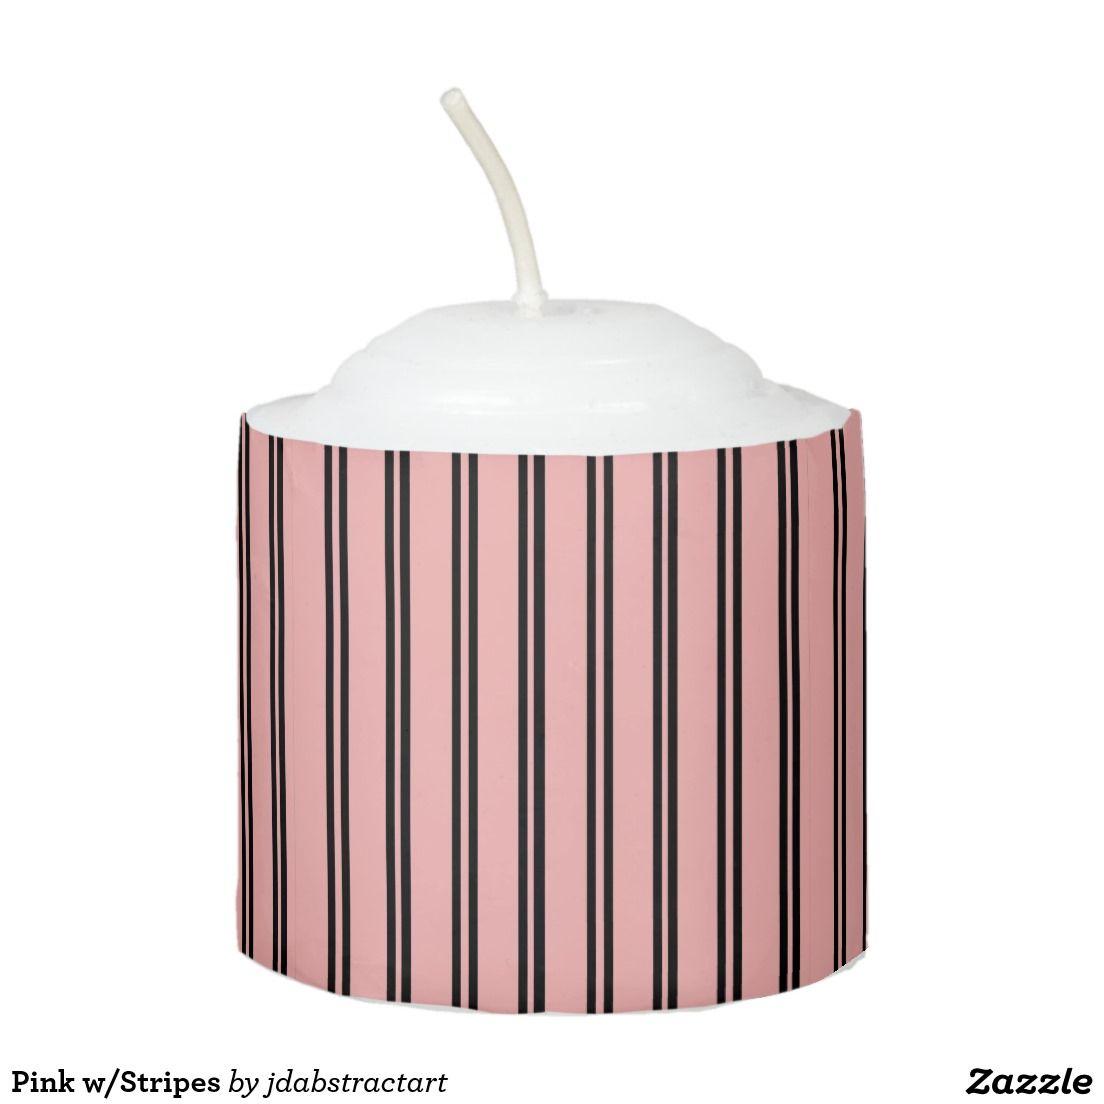 Pink w/Stripes